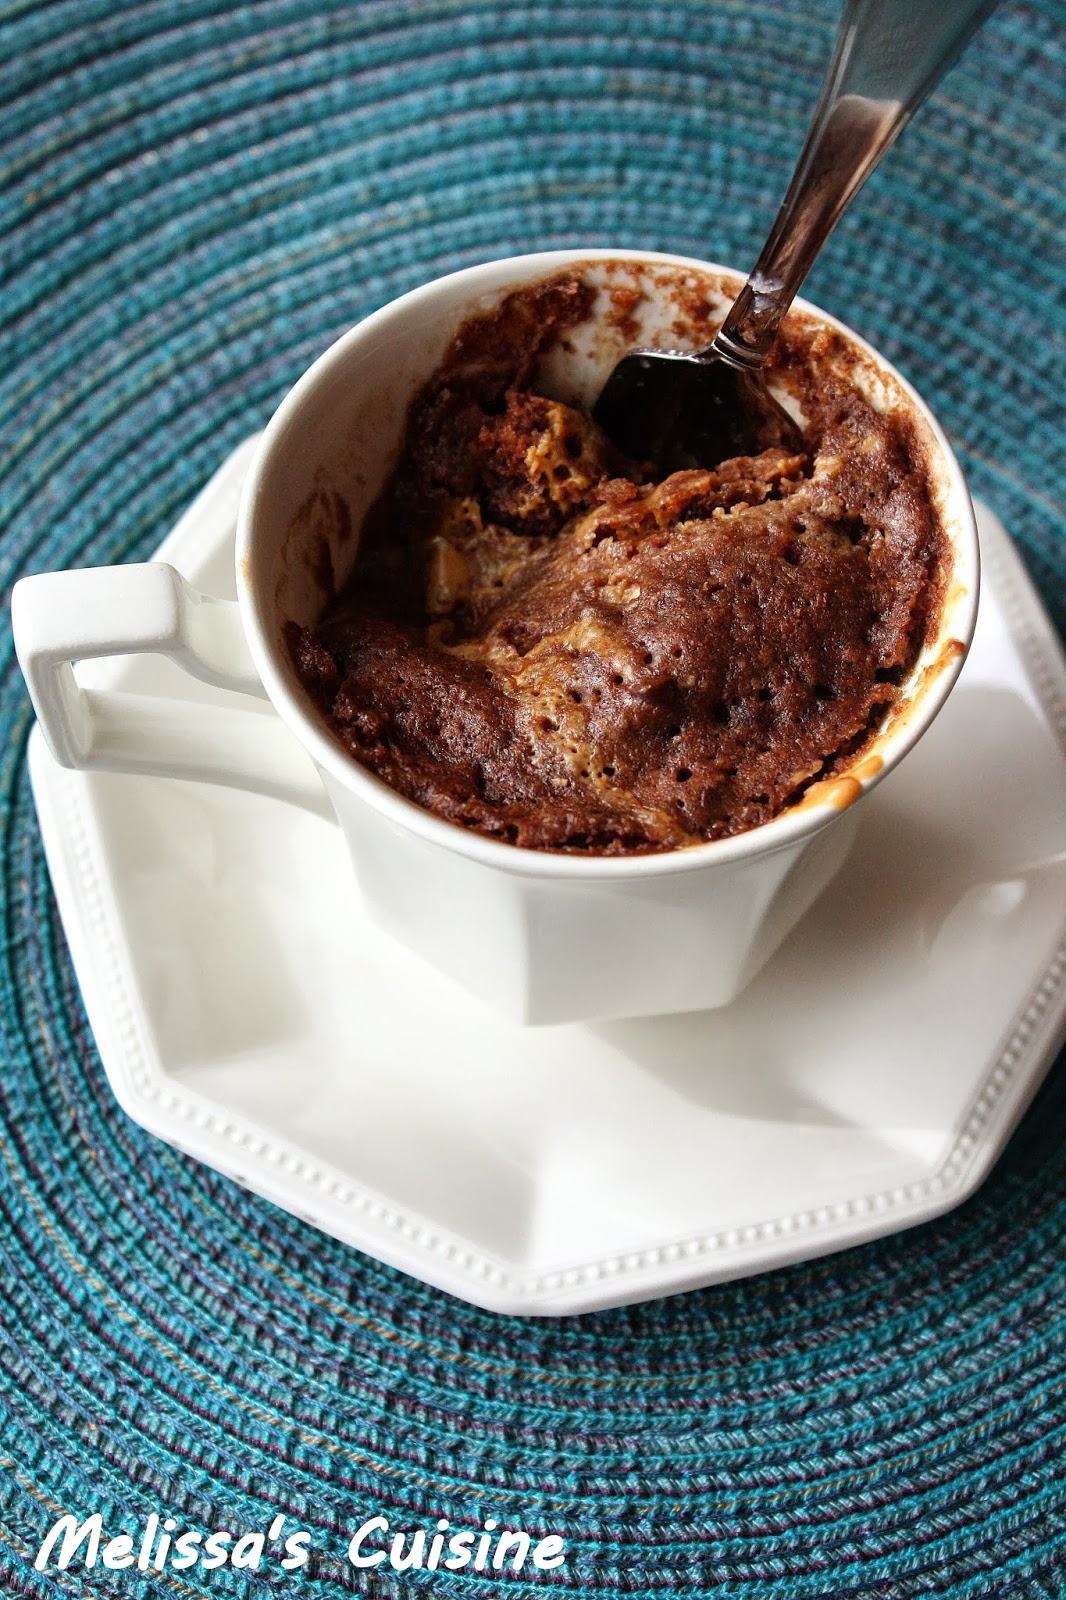 Melissa's Cuisine: Skinny Chocolate Peanut Butter Mug Cake